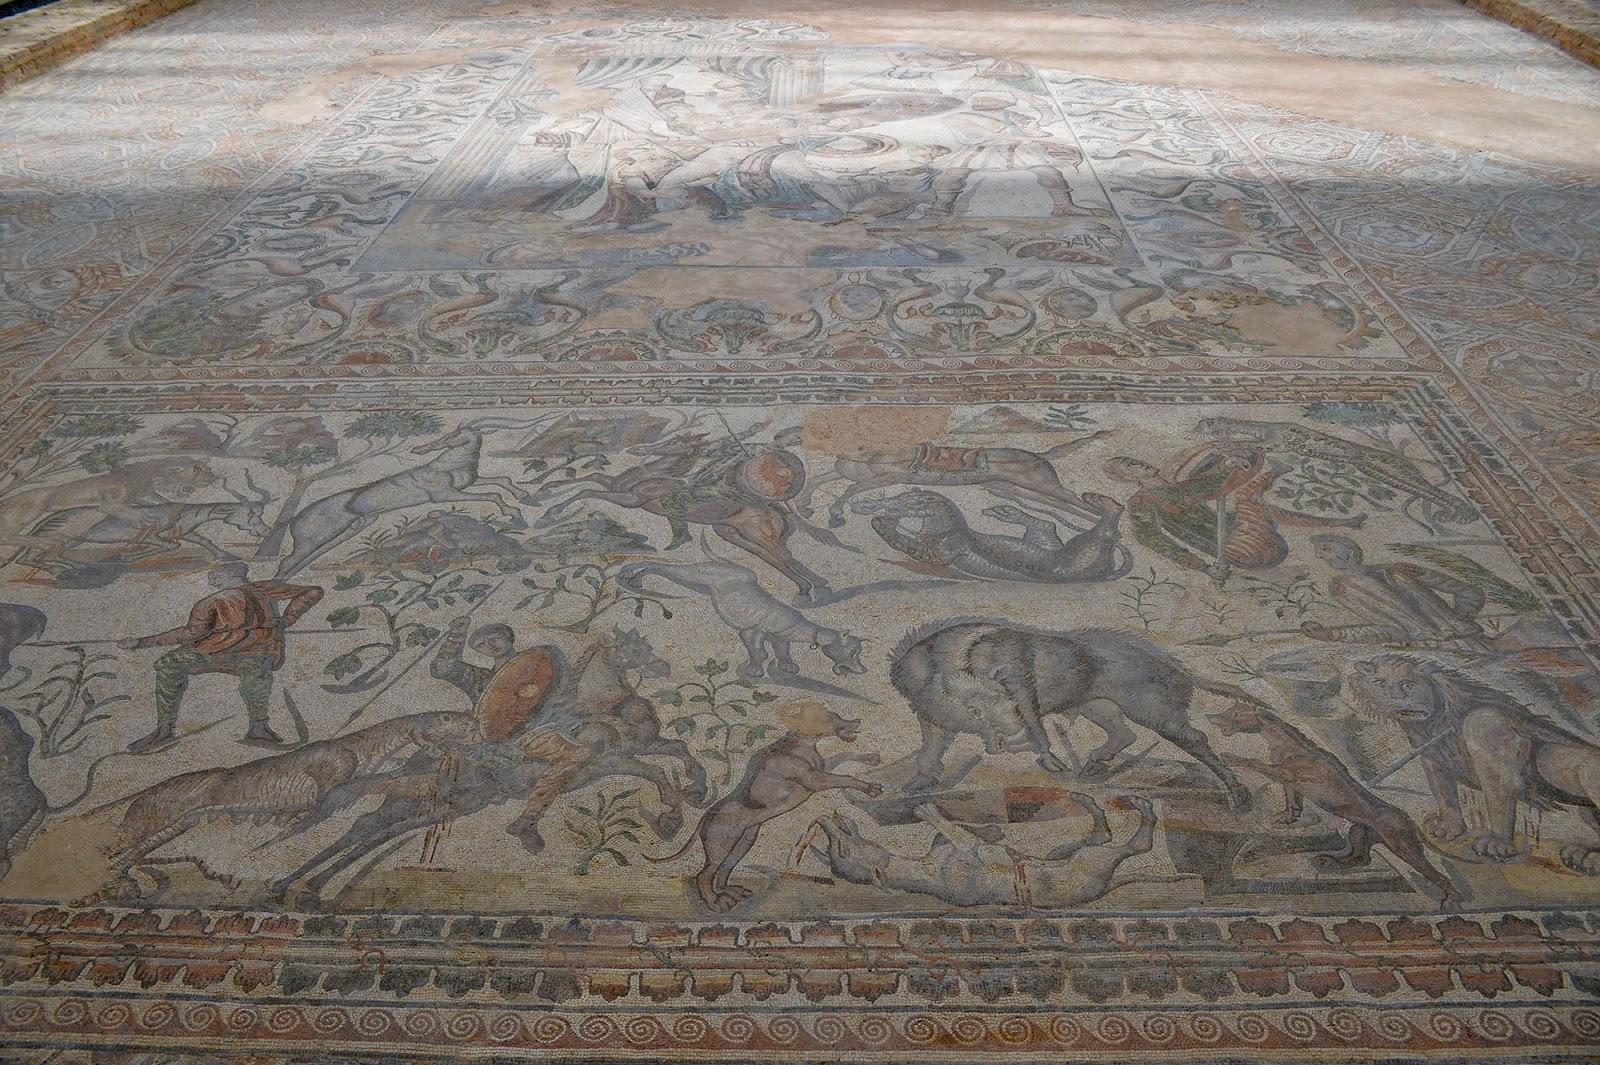 villa romana olmeda palencia mosaic roman ruins spain